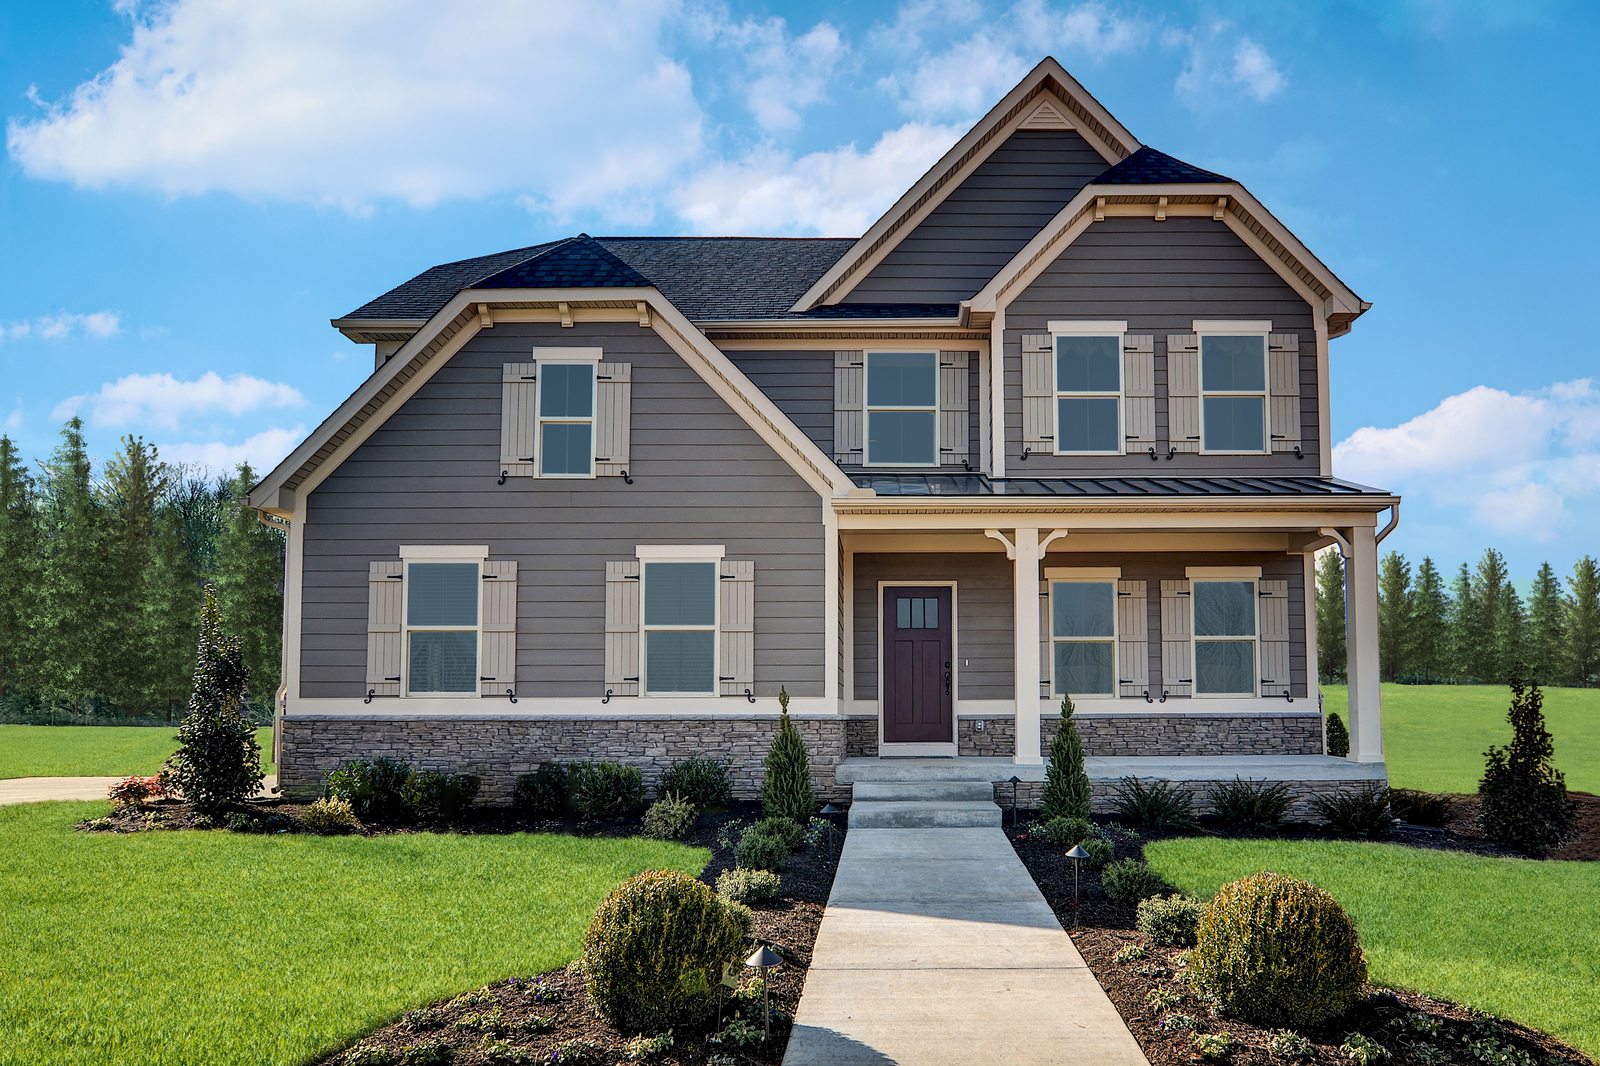 New genoa home model for sale heartland homes for Heartland homes pittsburgh floor plans